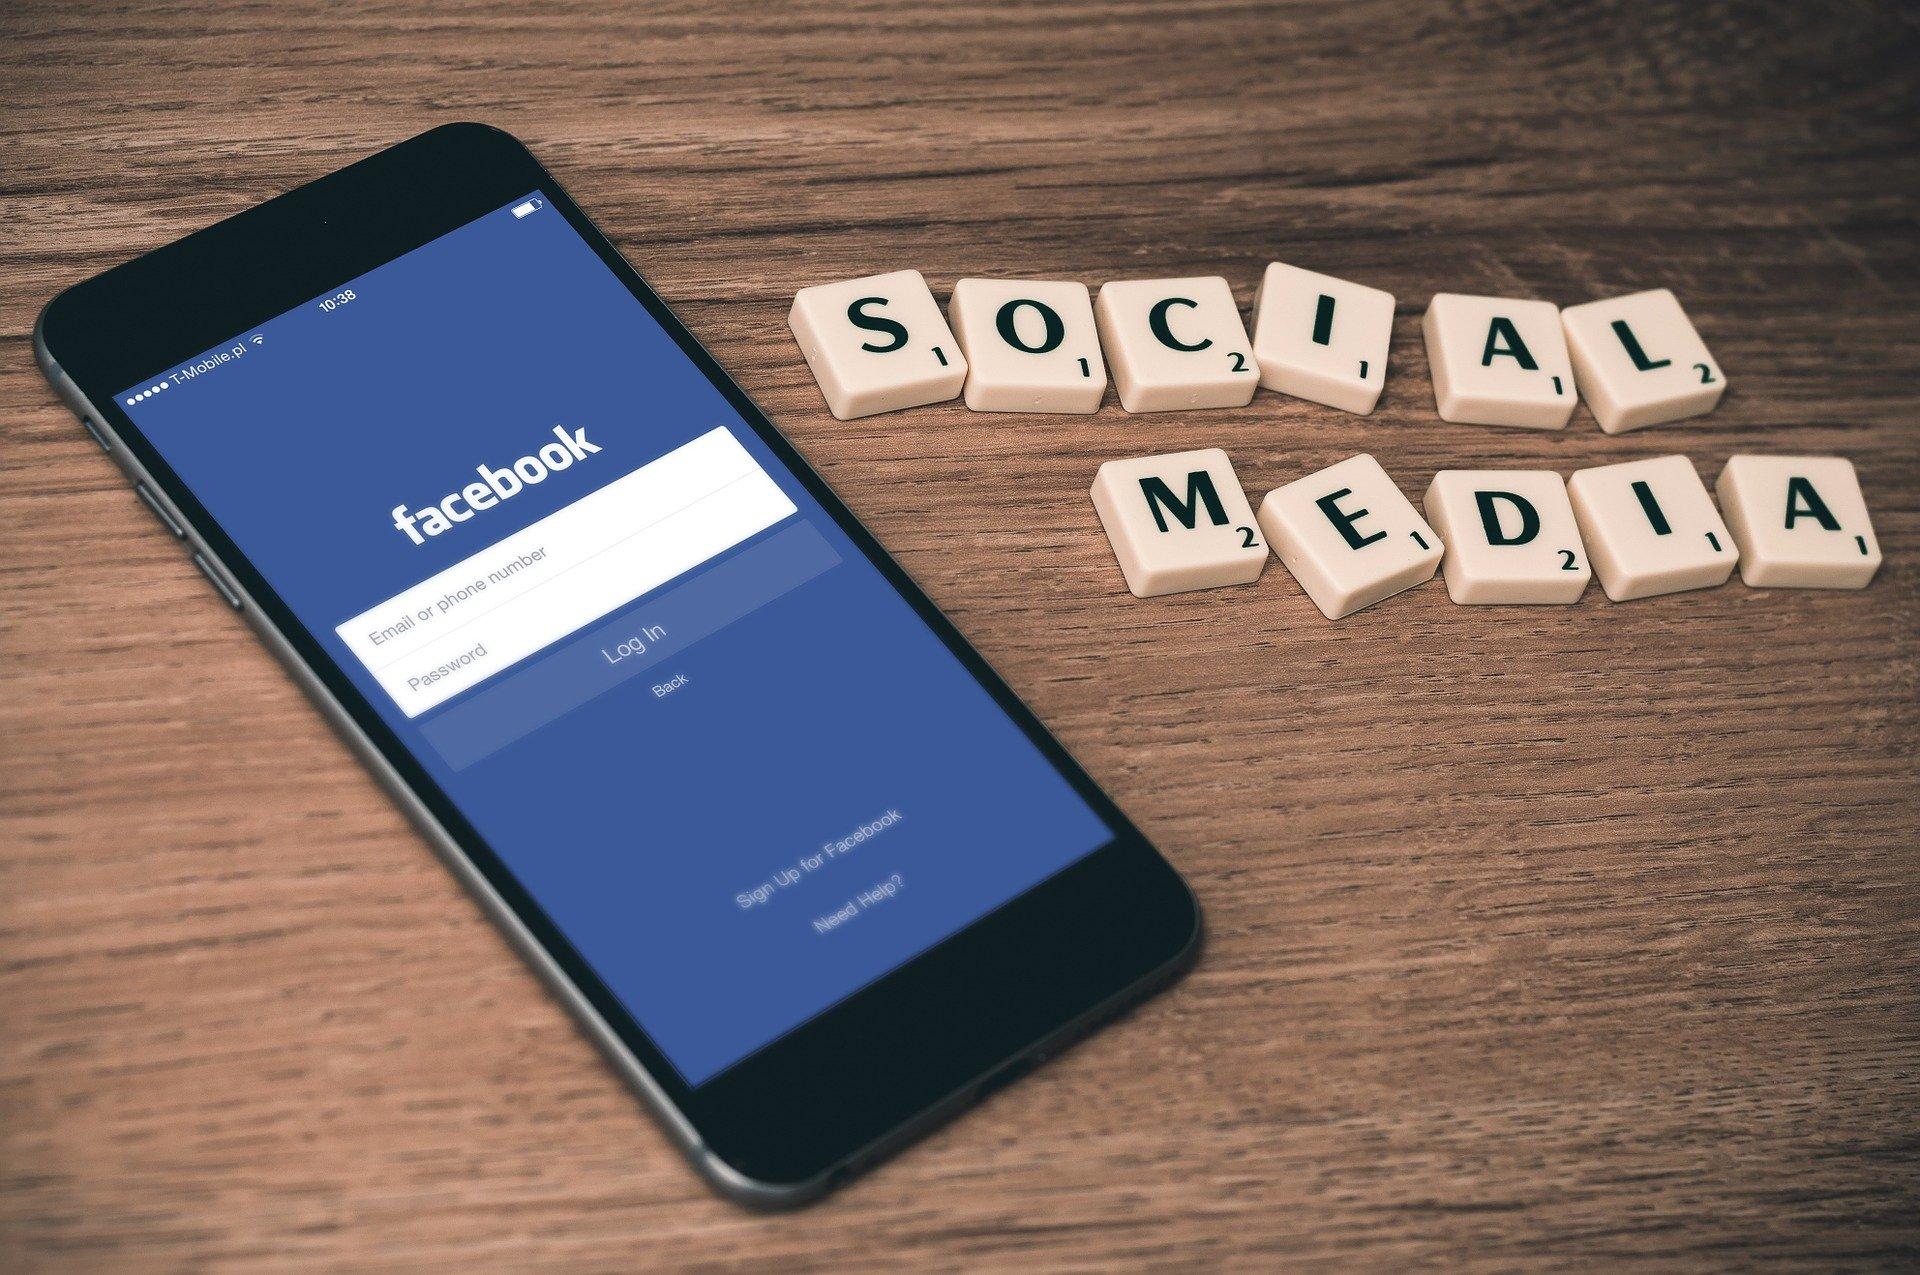 Does Posting Facebook Status Updates Increase or Decrease Loneliness?